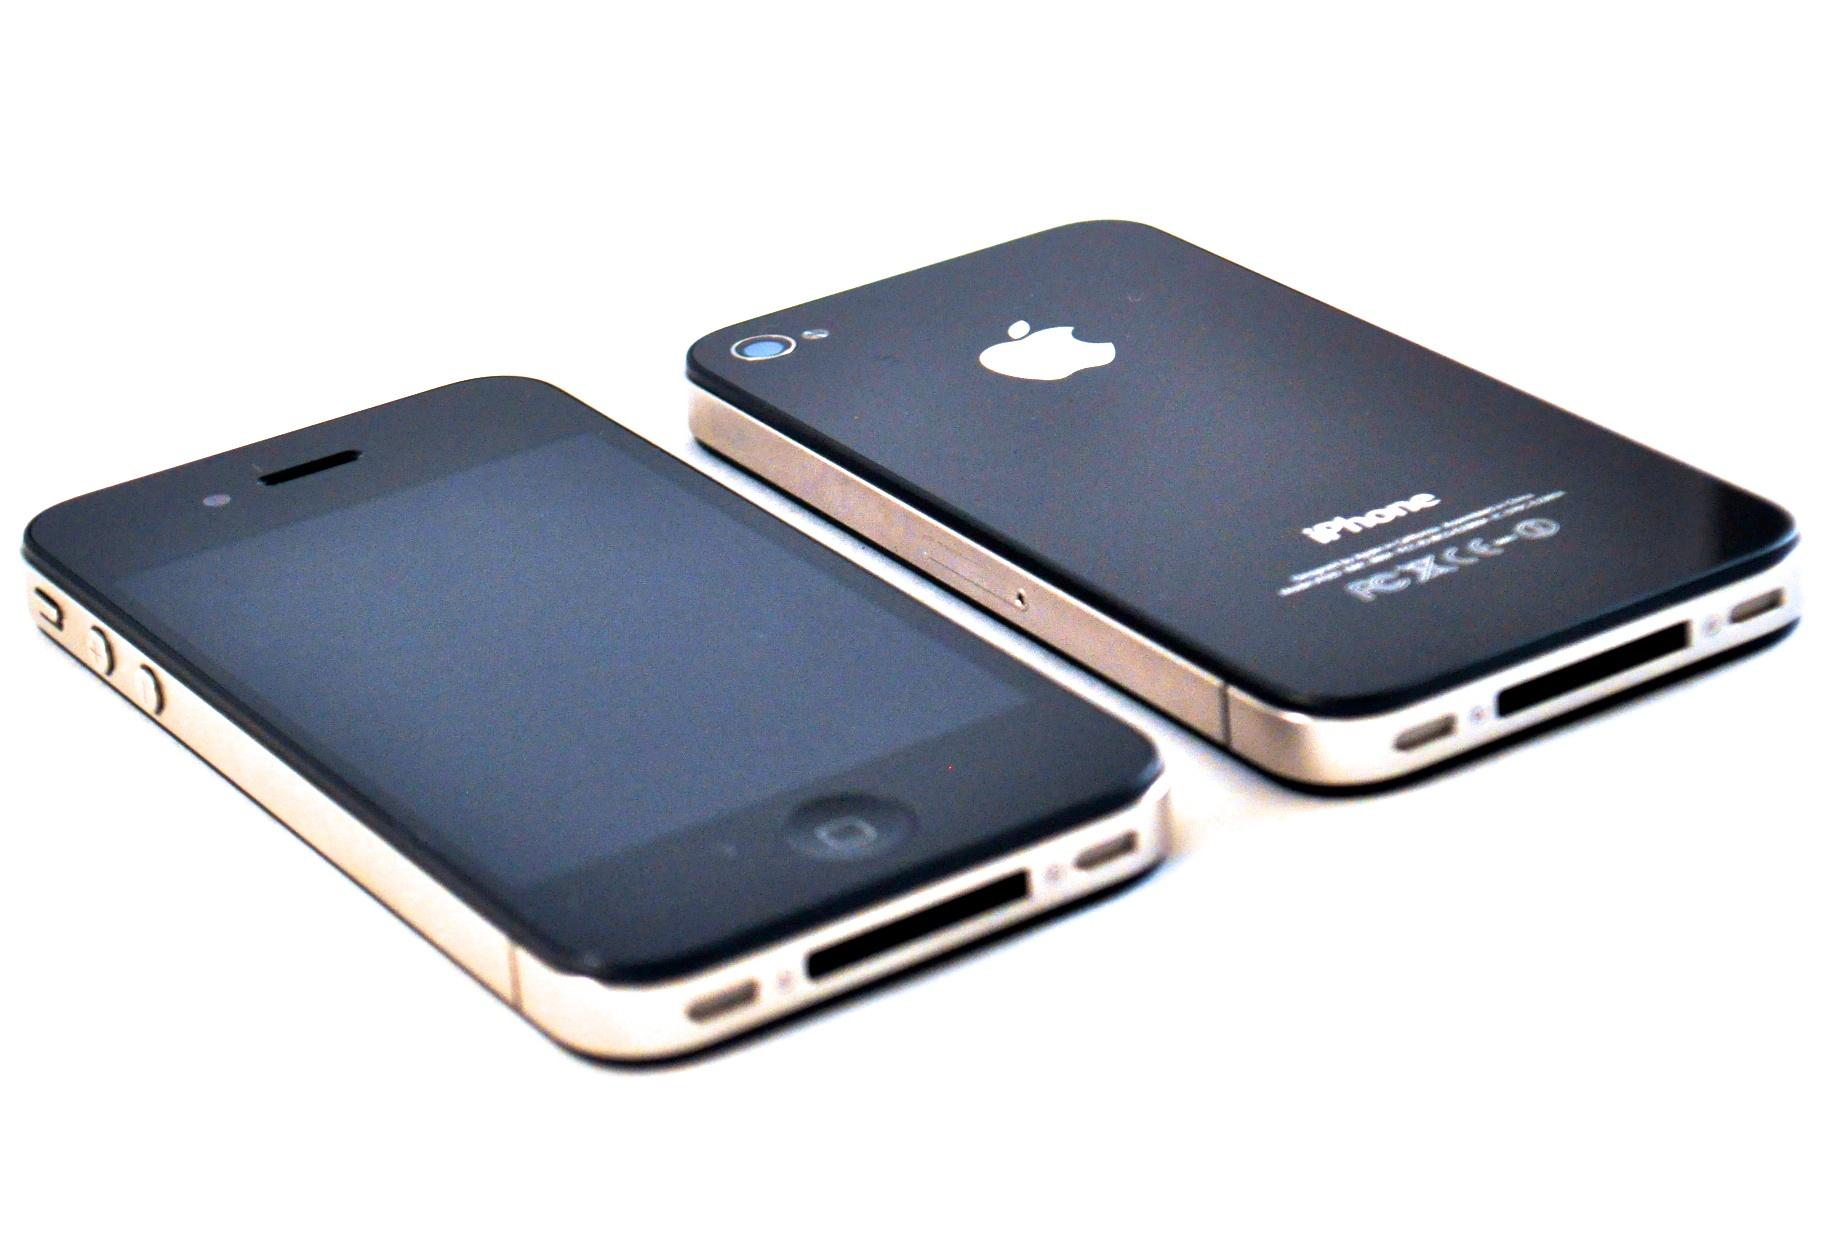 iphone 4G 32GB garansi platinum 1 tahun